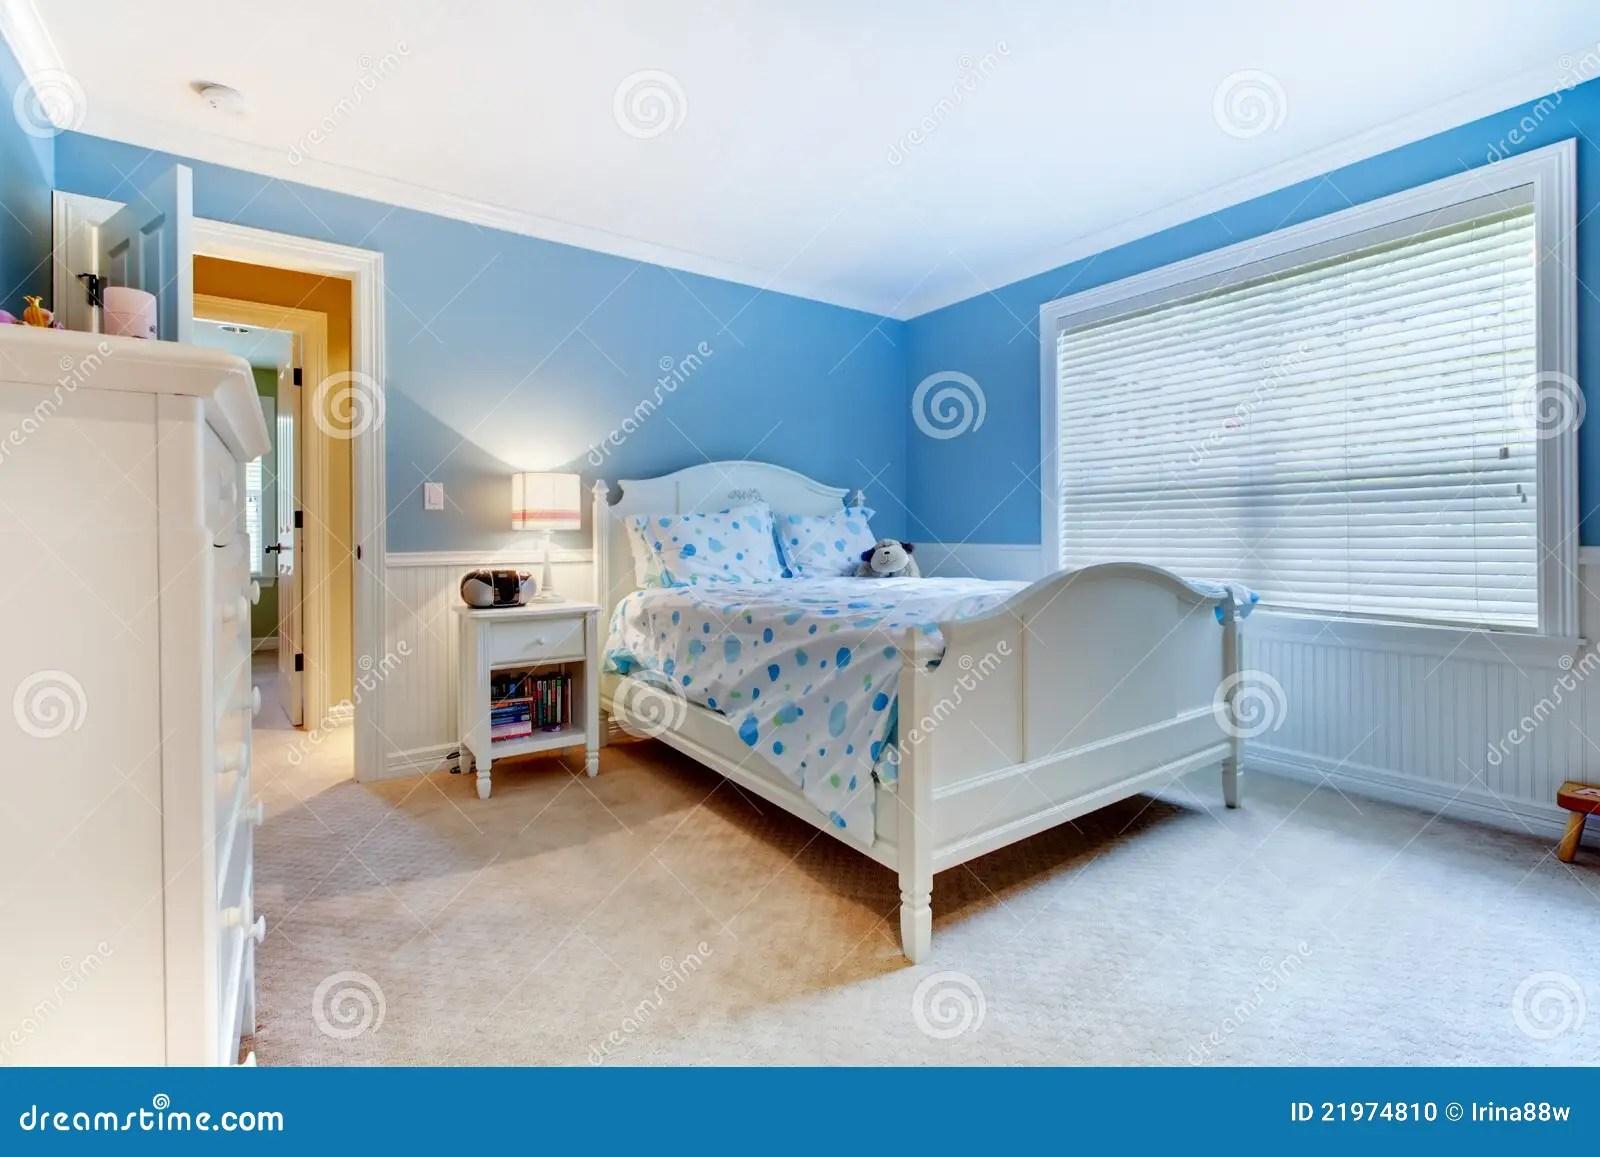 Blue Girls Kids Bedroom Interior Stock Photo  Image